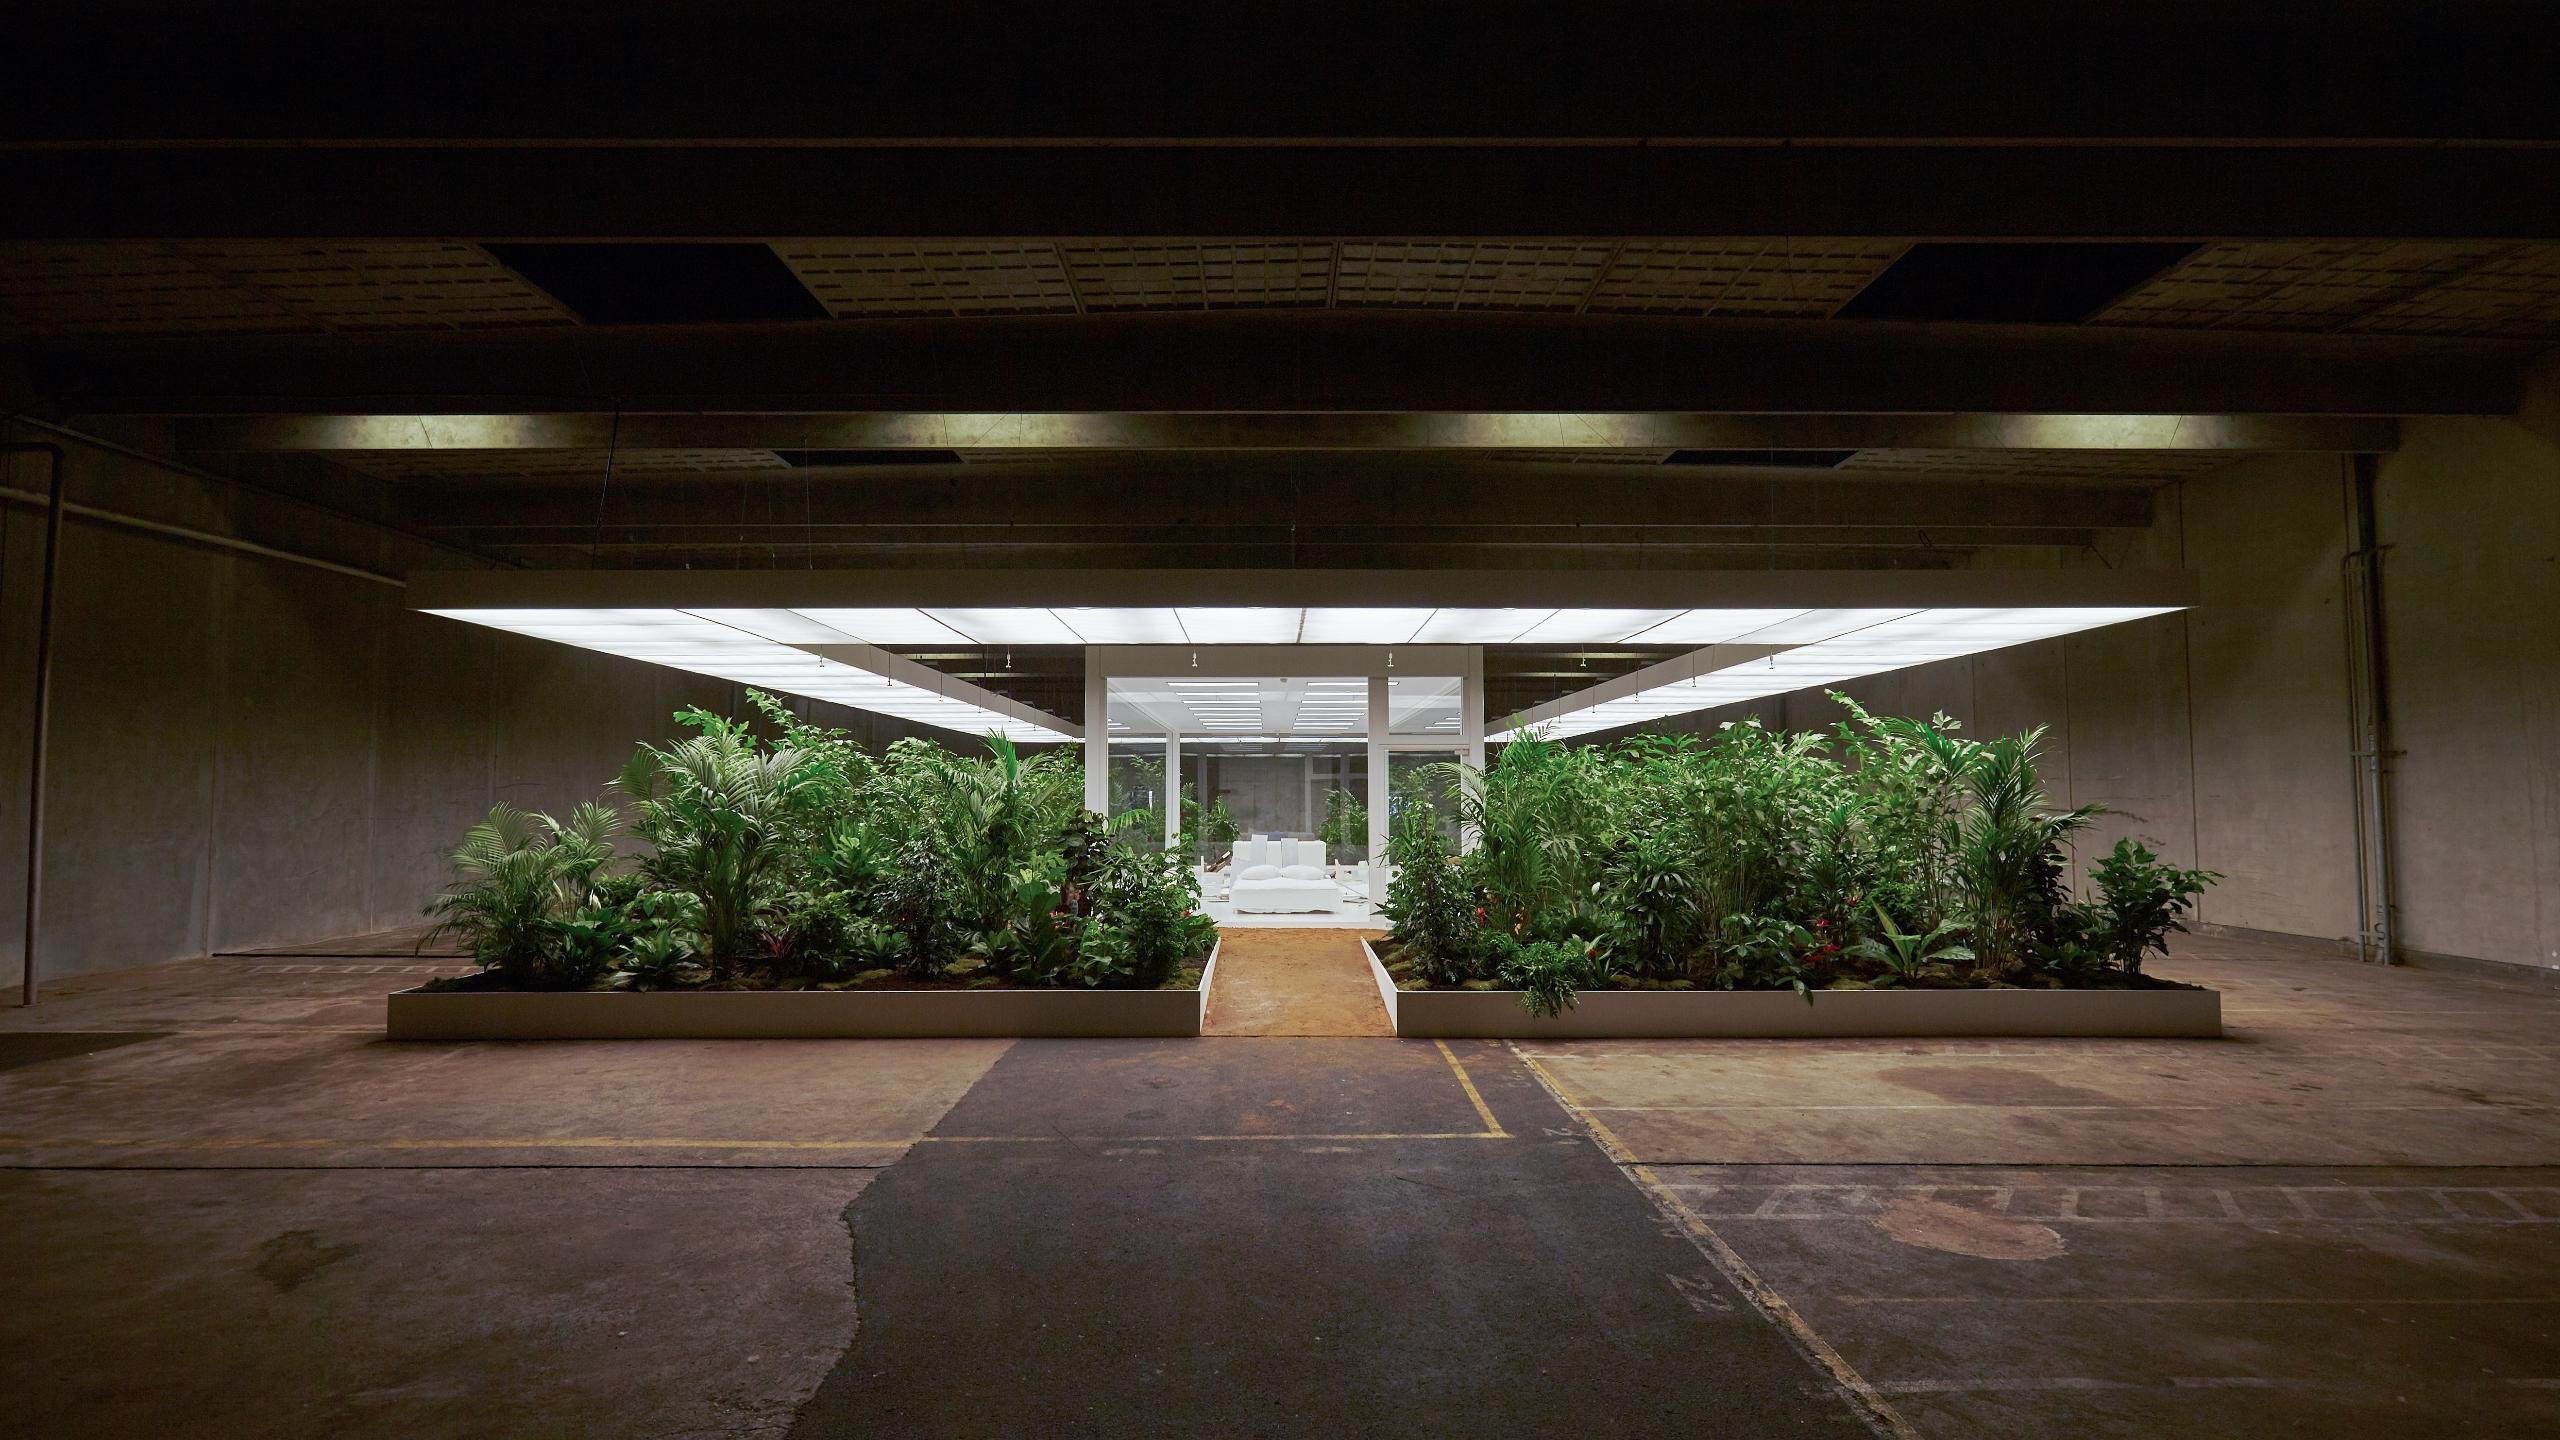 Garden Doug Aitken - artwork, art - jdthevike | ello